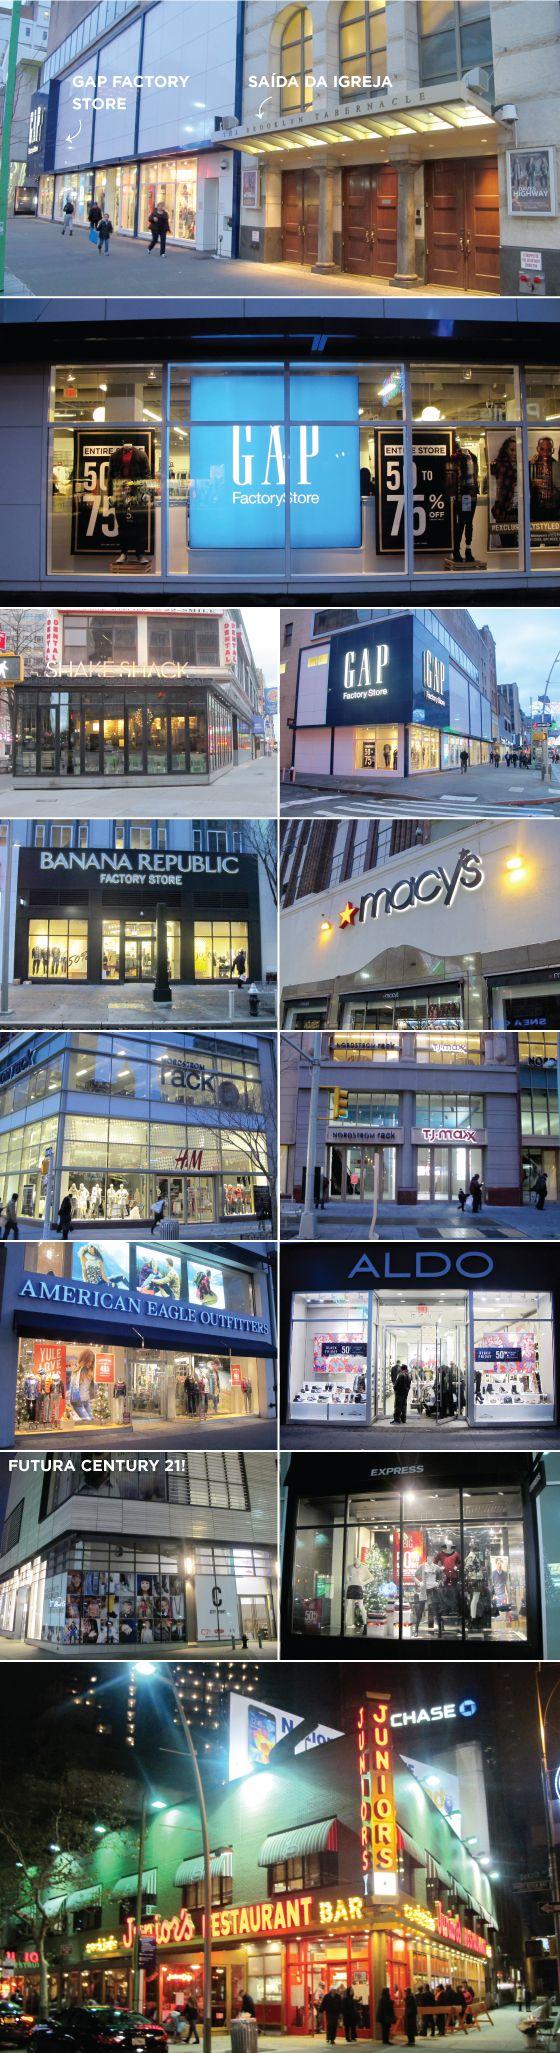 lojas-outlet-factory-store-brooklyn-fulton-mall-compras-desconto-nordstrom-rack-tj-maxx-gap-banana-republic-shake-shack-american-eagle